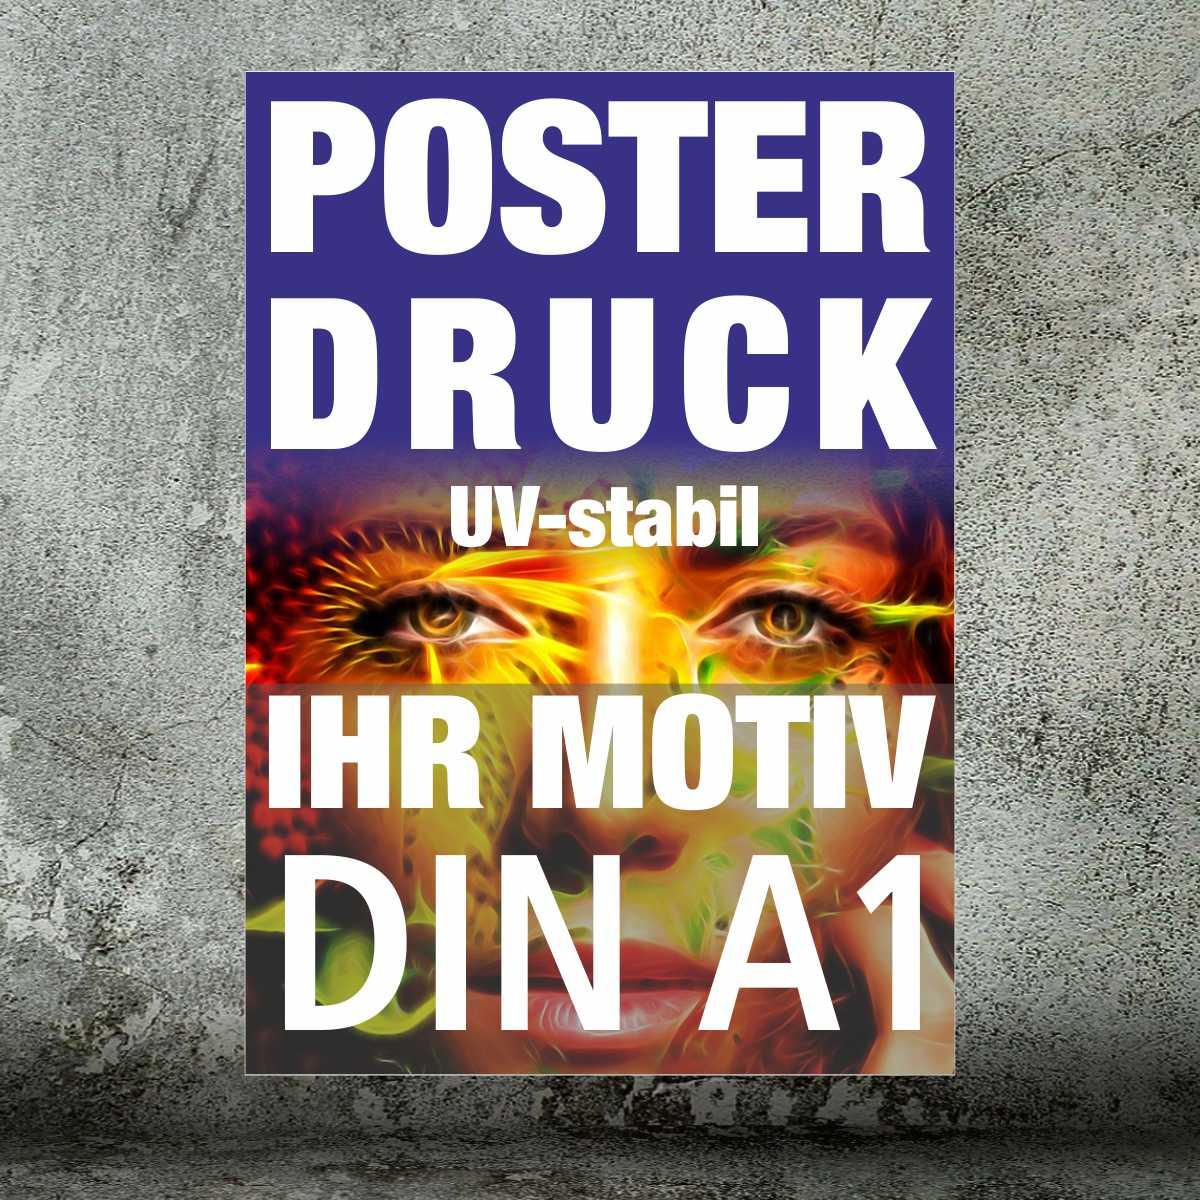 Plakate und Poster · DIN A1 4/0-farbig (ab 1 Stück)